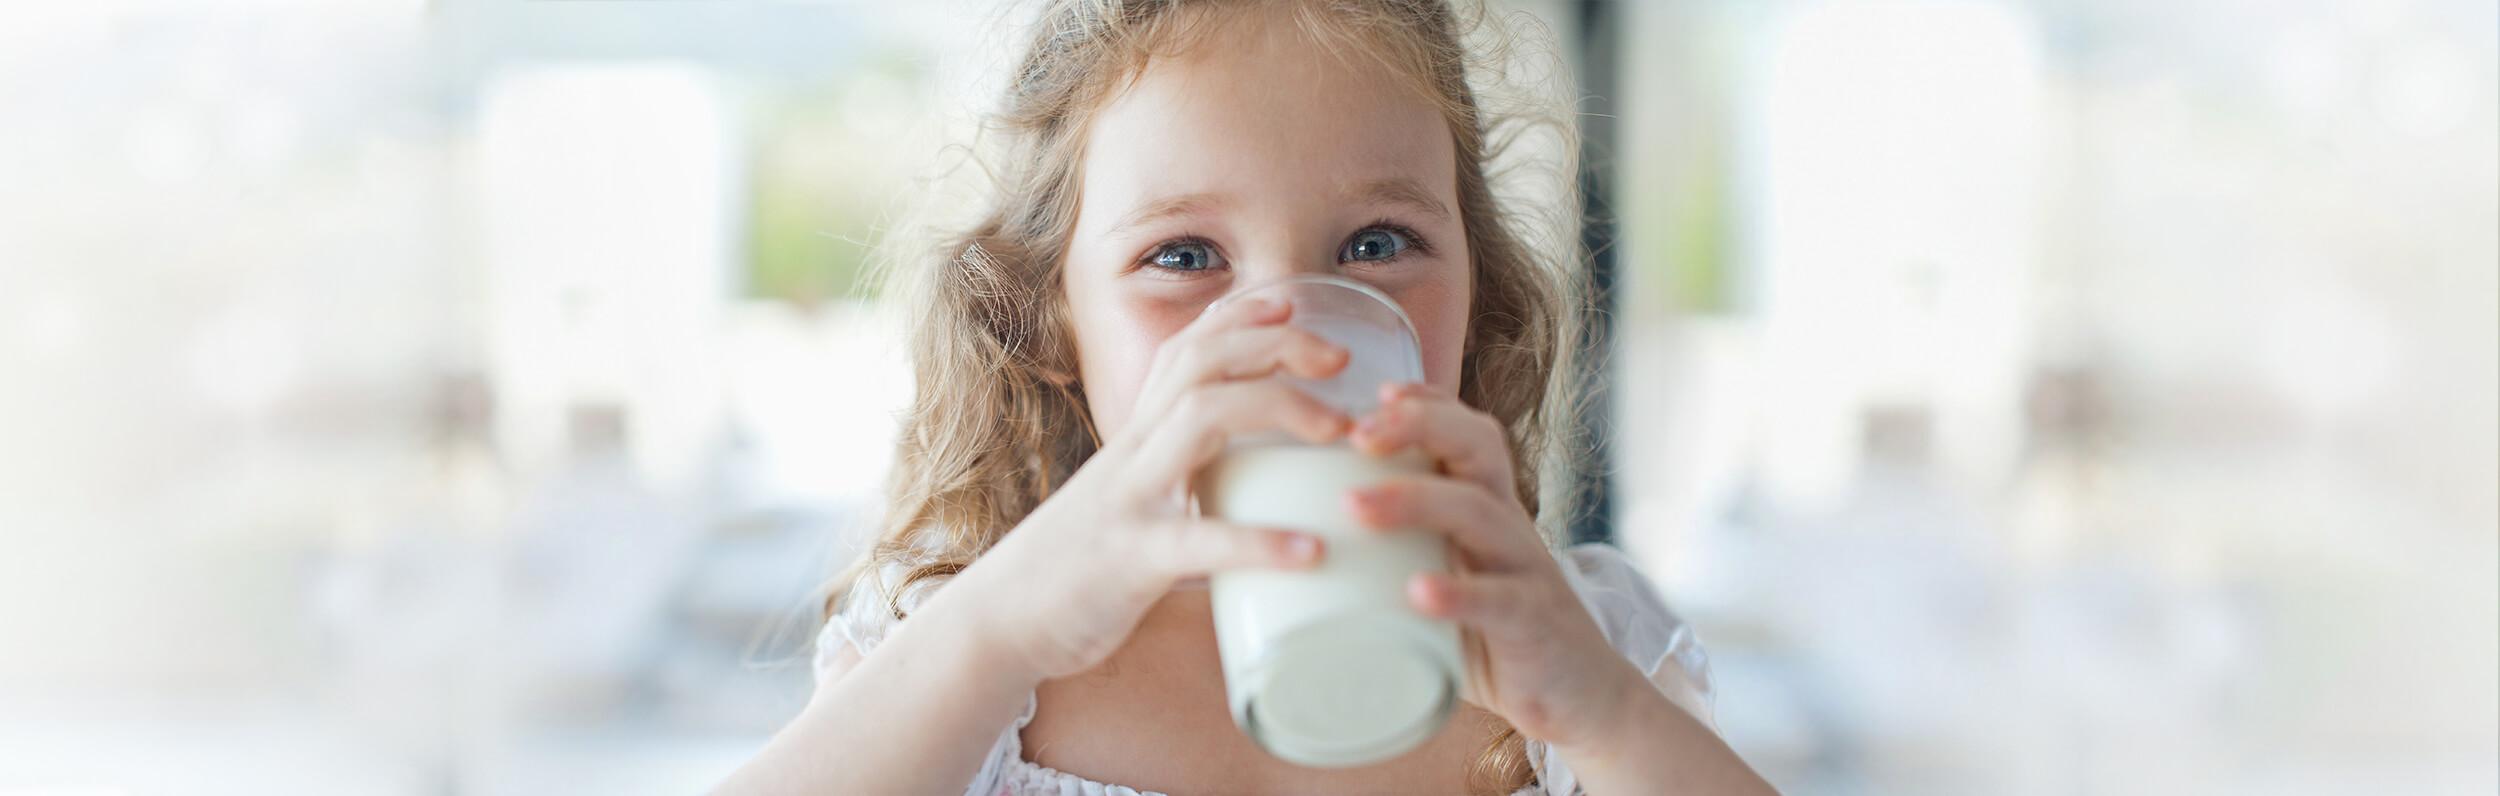 food program for daycare providers - little girl drinking milk - Novick Childcare